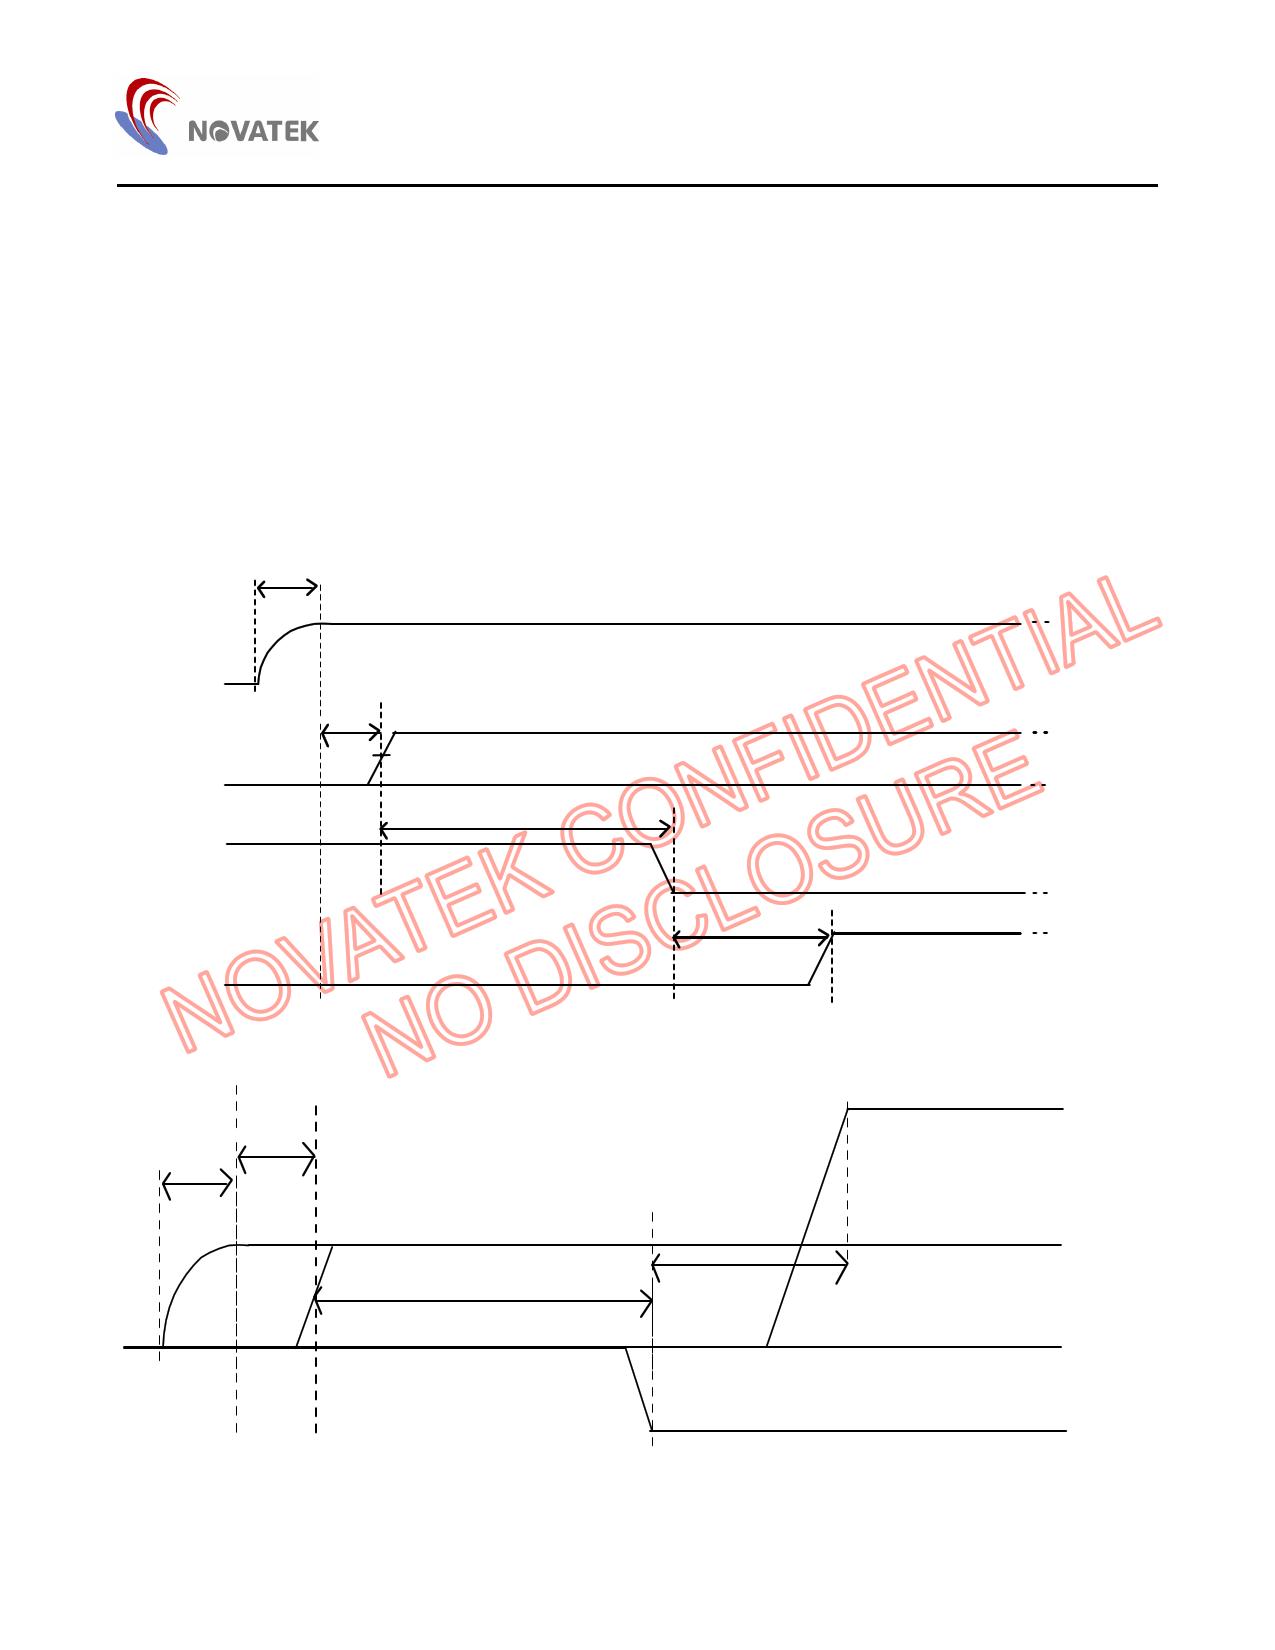 NT39211 diode, scr